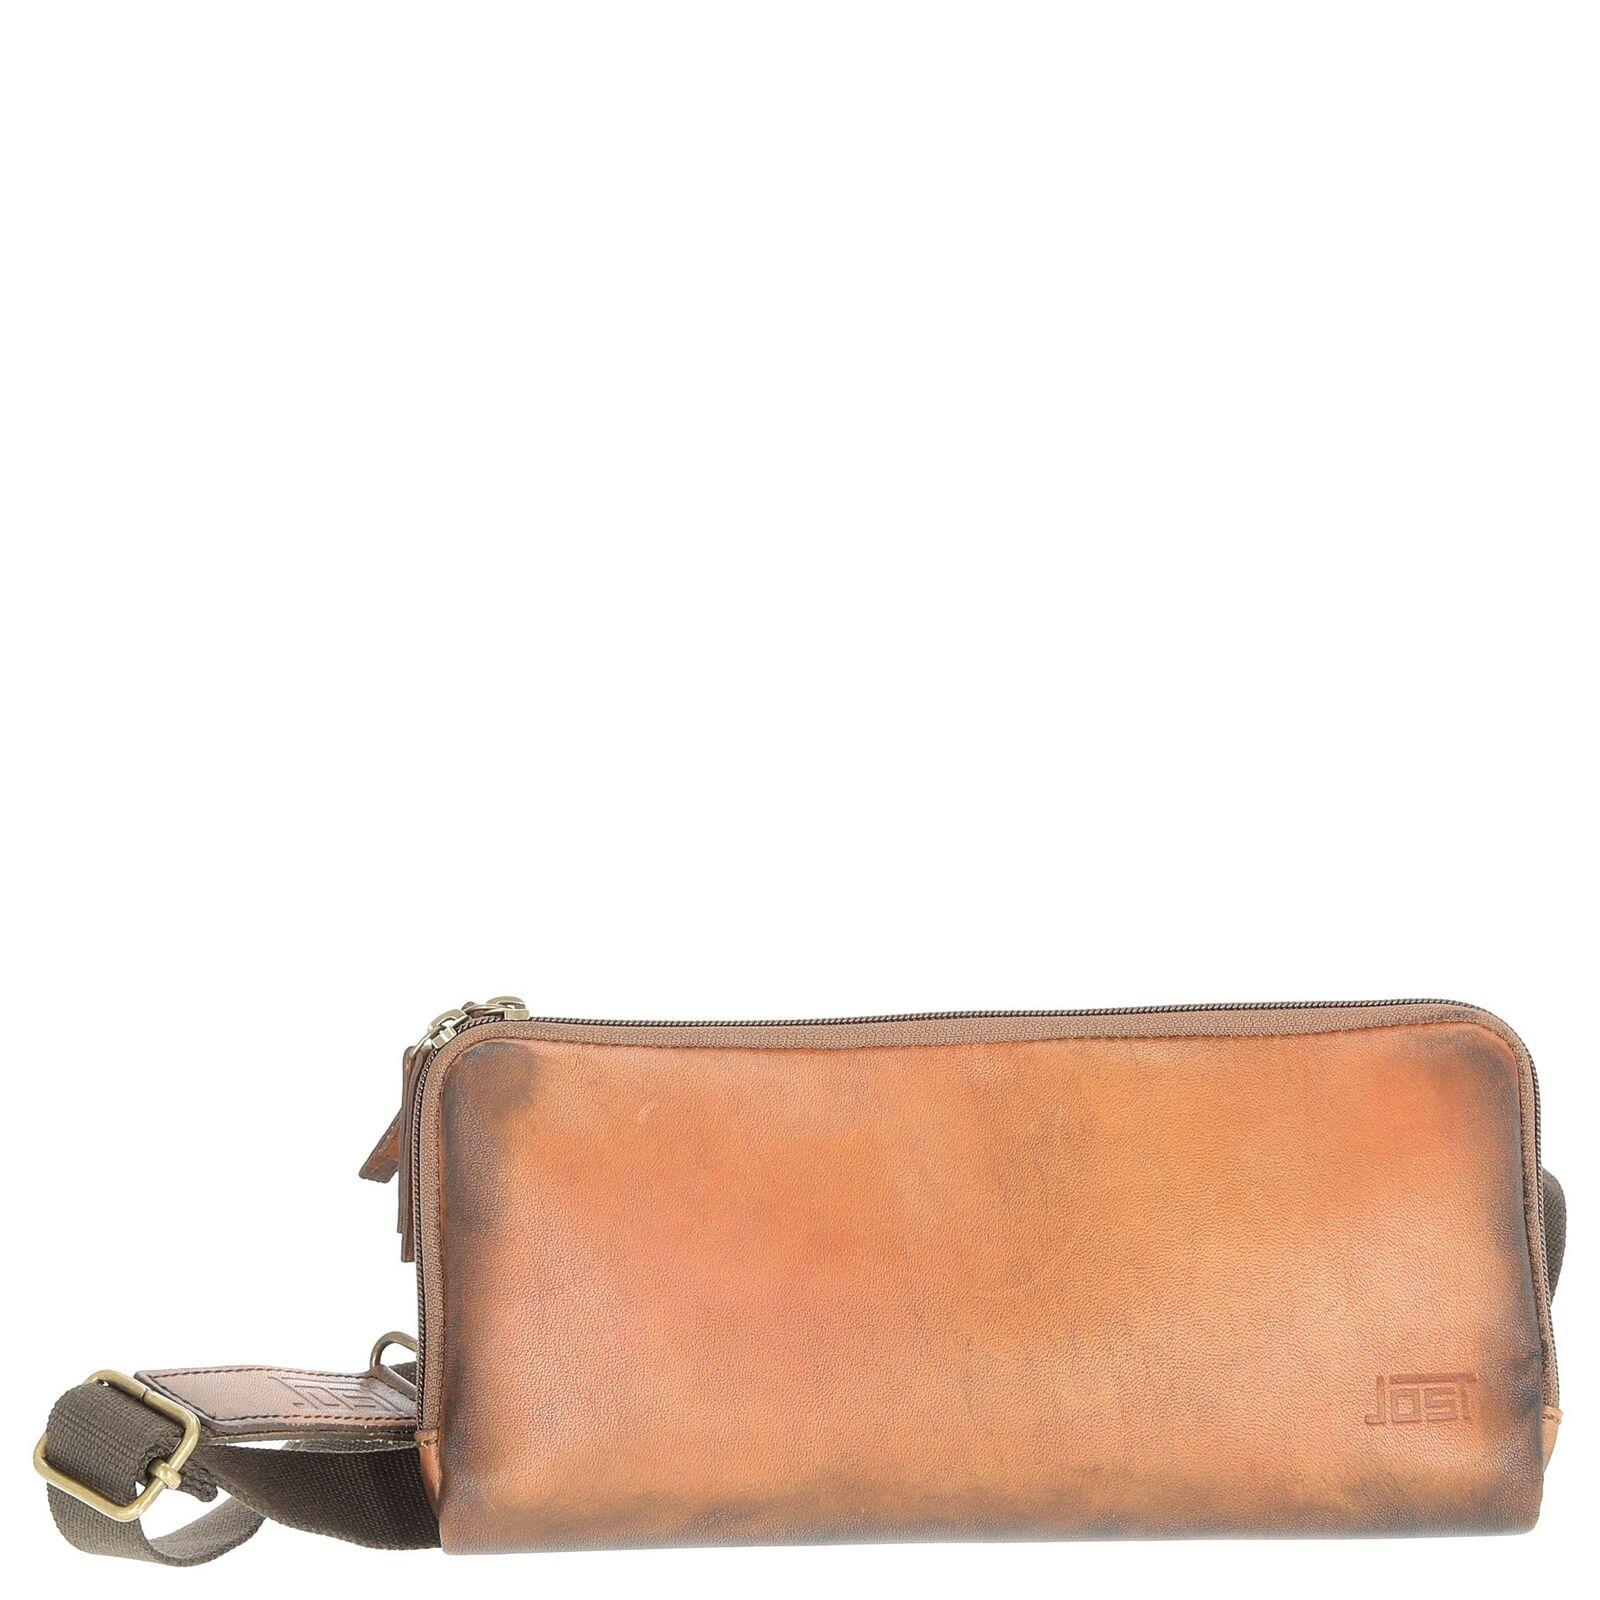 Jost Randers Crotver Bag   Gürteltasche 28 cm NEU    | Neues Produkt